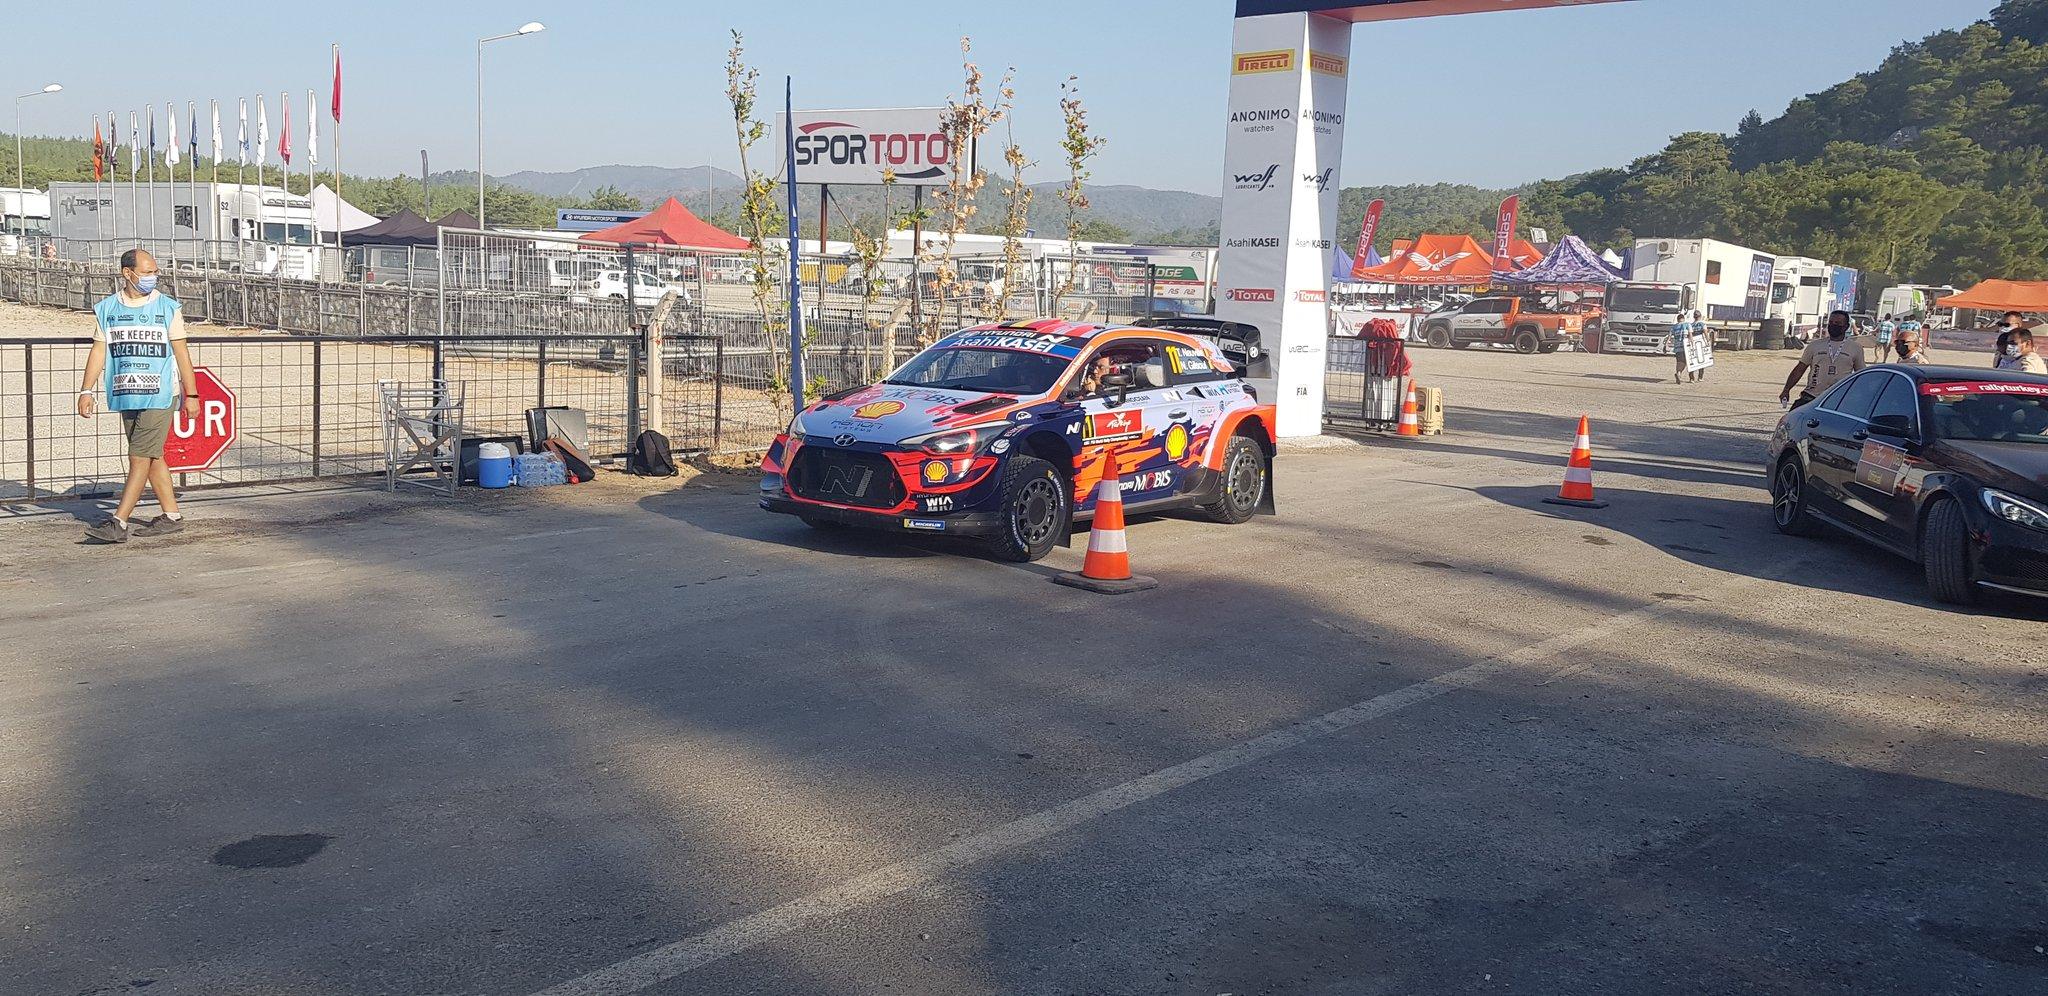 WRC: Marmaris Rally Turkey [18-20 Septiembre] - Página 2 EiLo1lyWsAAGhlk?format=jpg&name=large